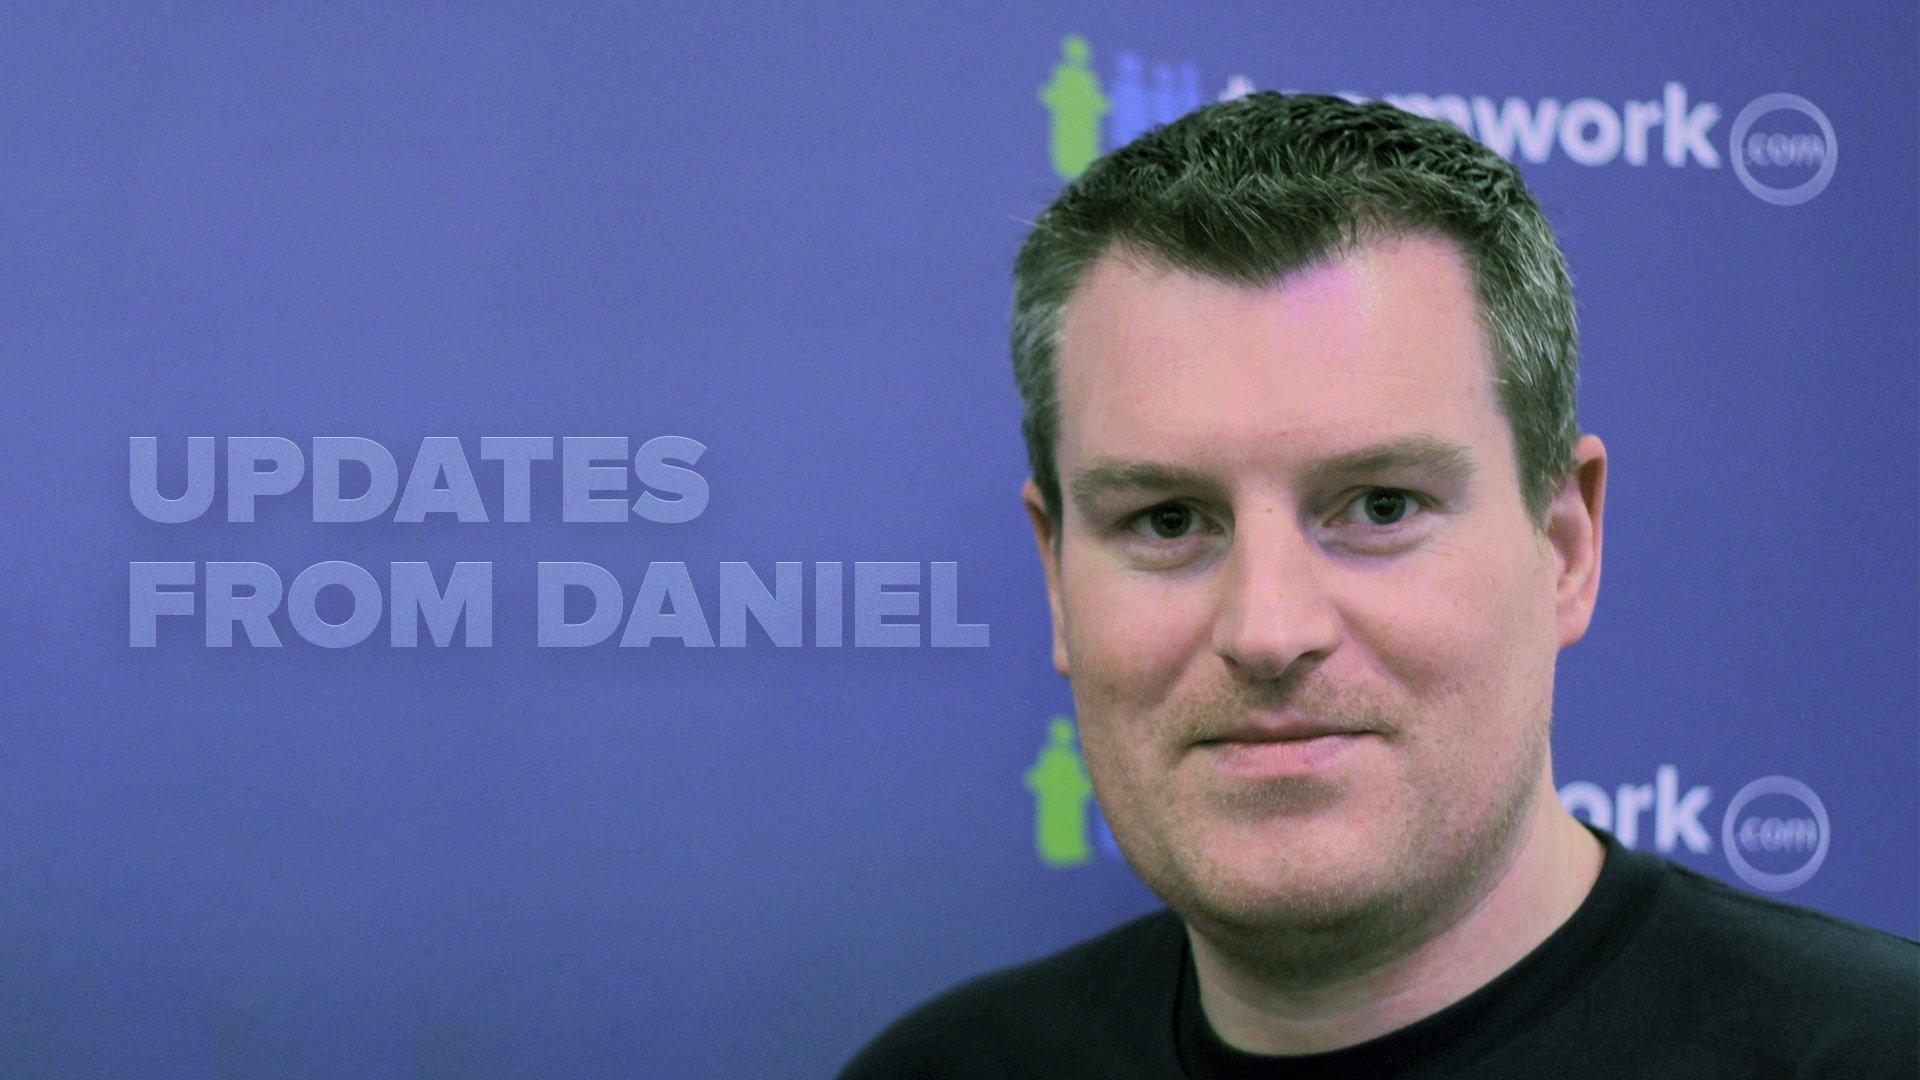 Updates from Daniel